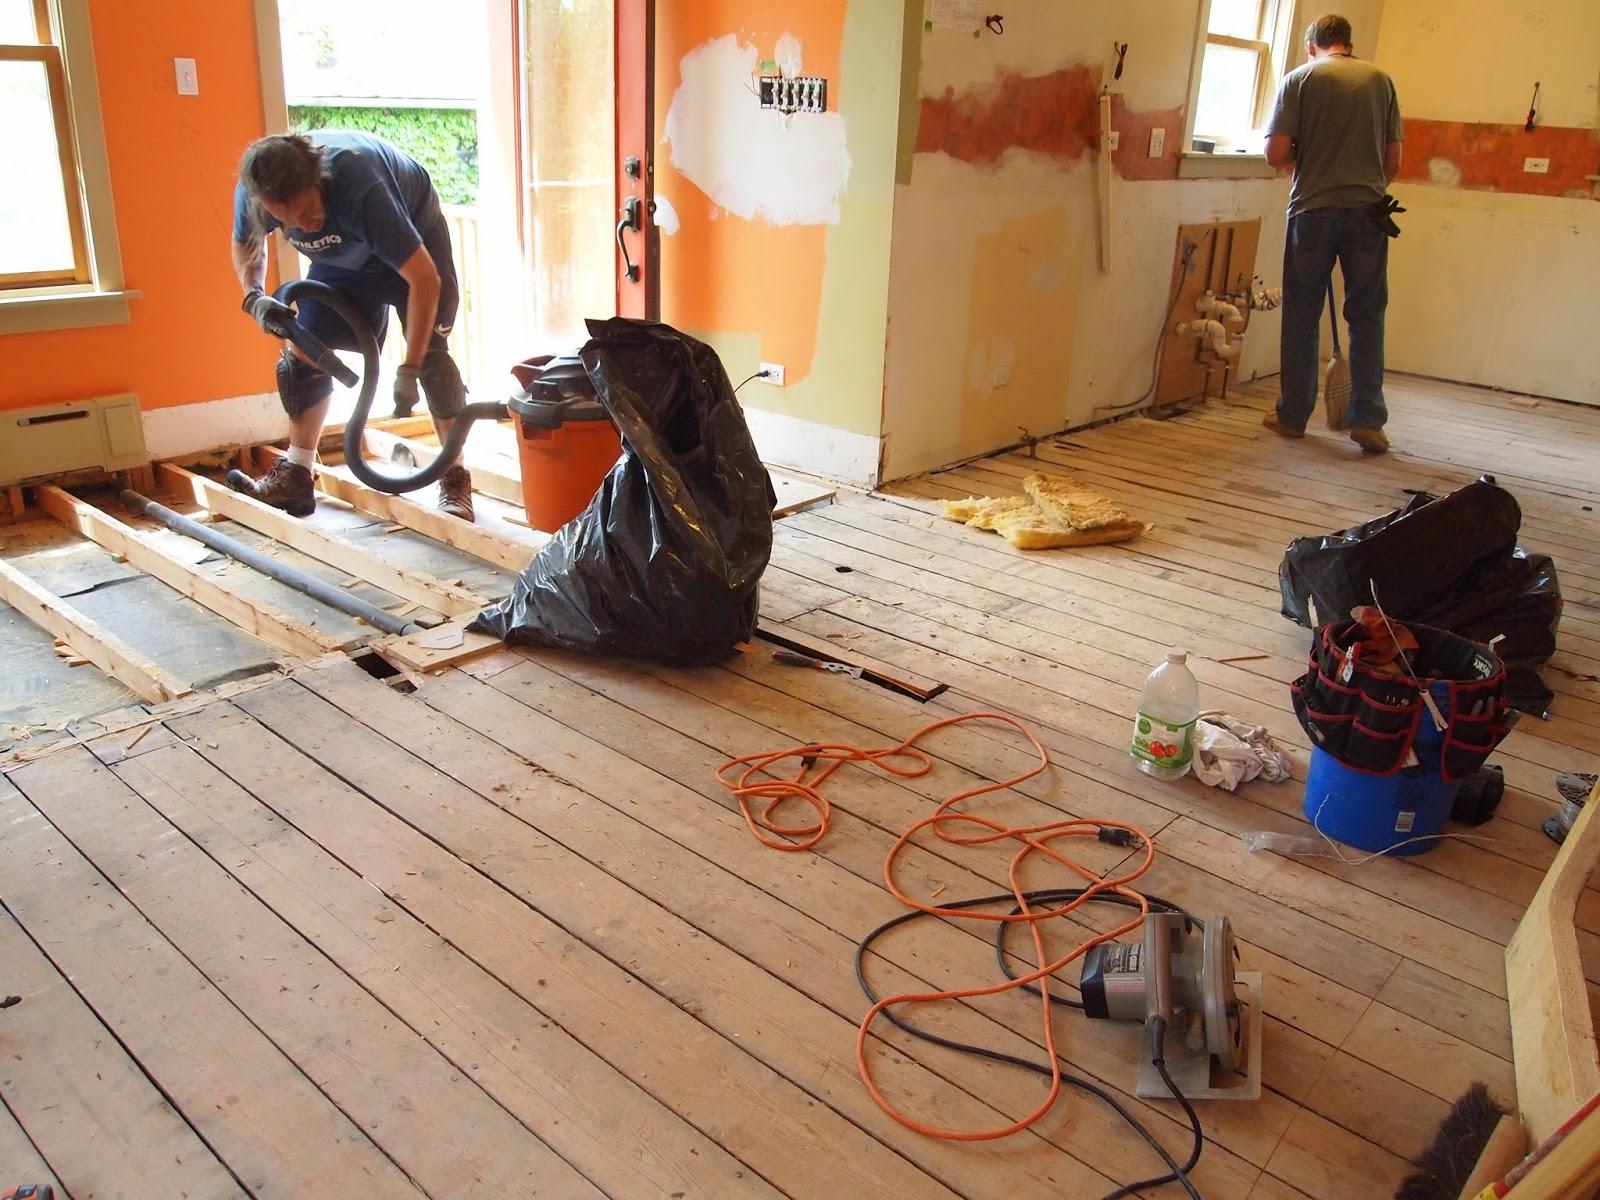 The Floor Beneath My Feet Nail It Down Installing The Bamboo Floor